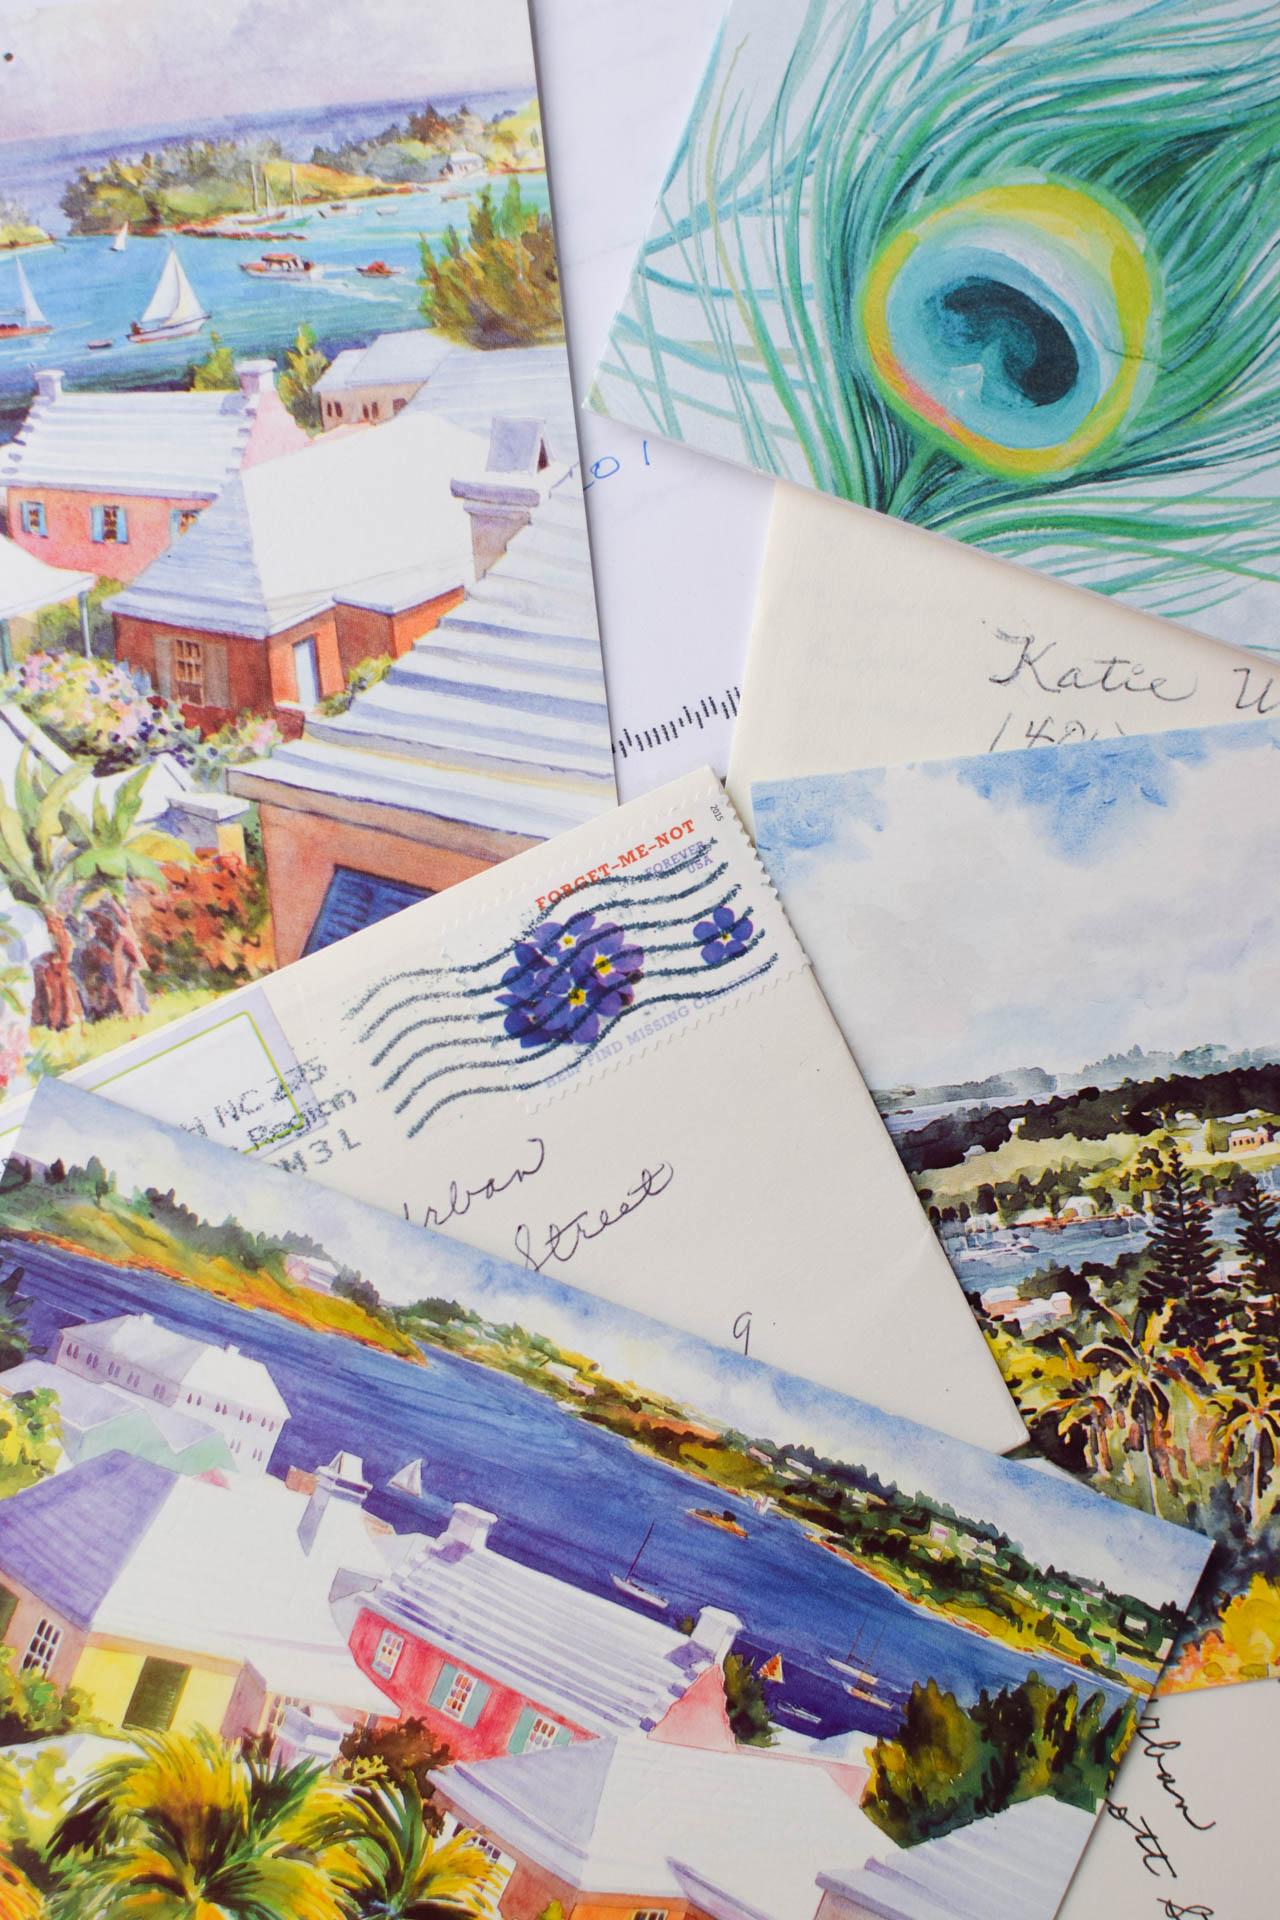 do you send handwritten letters